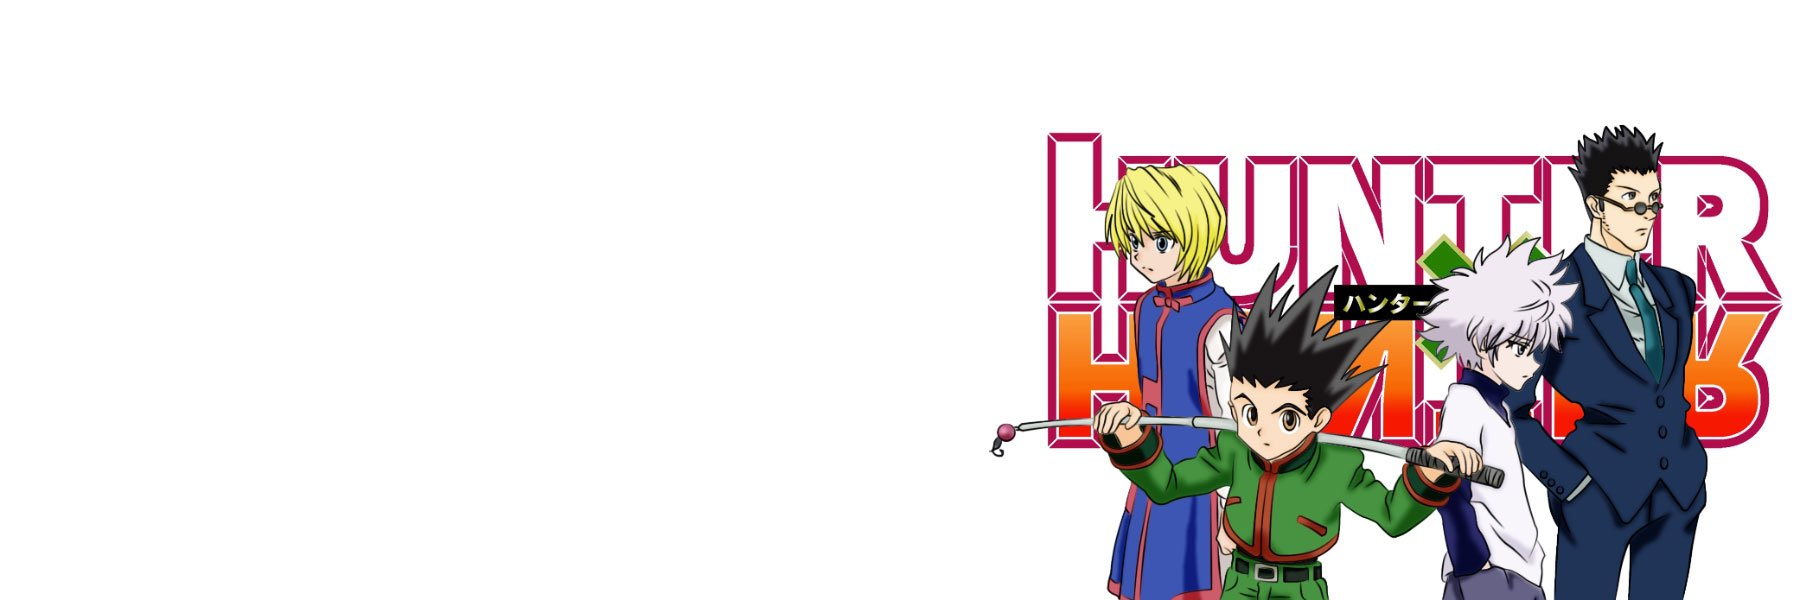 HUNTER×HUNTER to Return to Weekly Shonen Jump